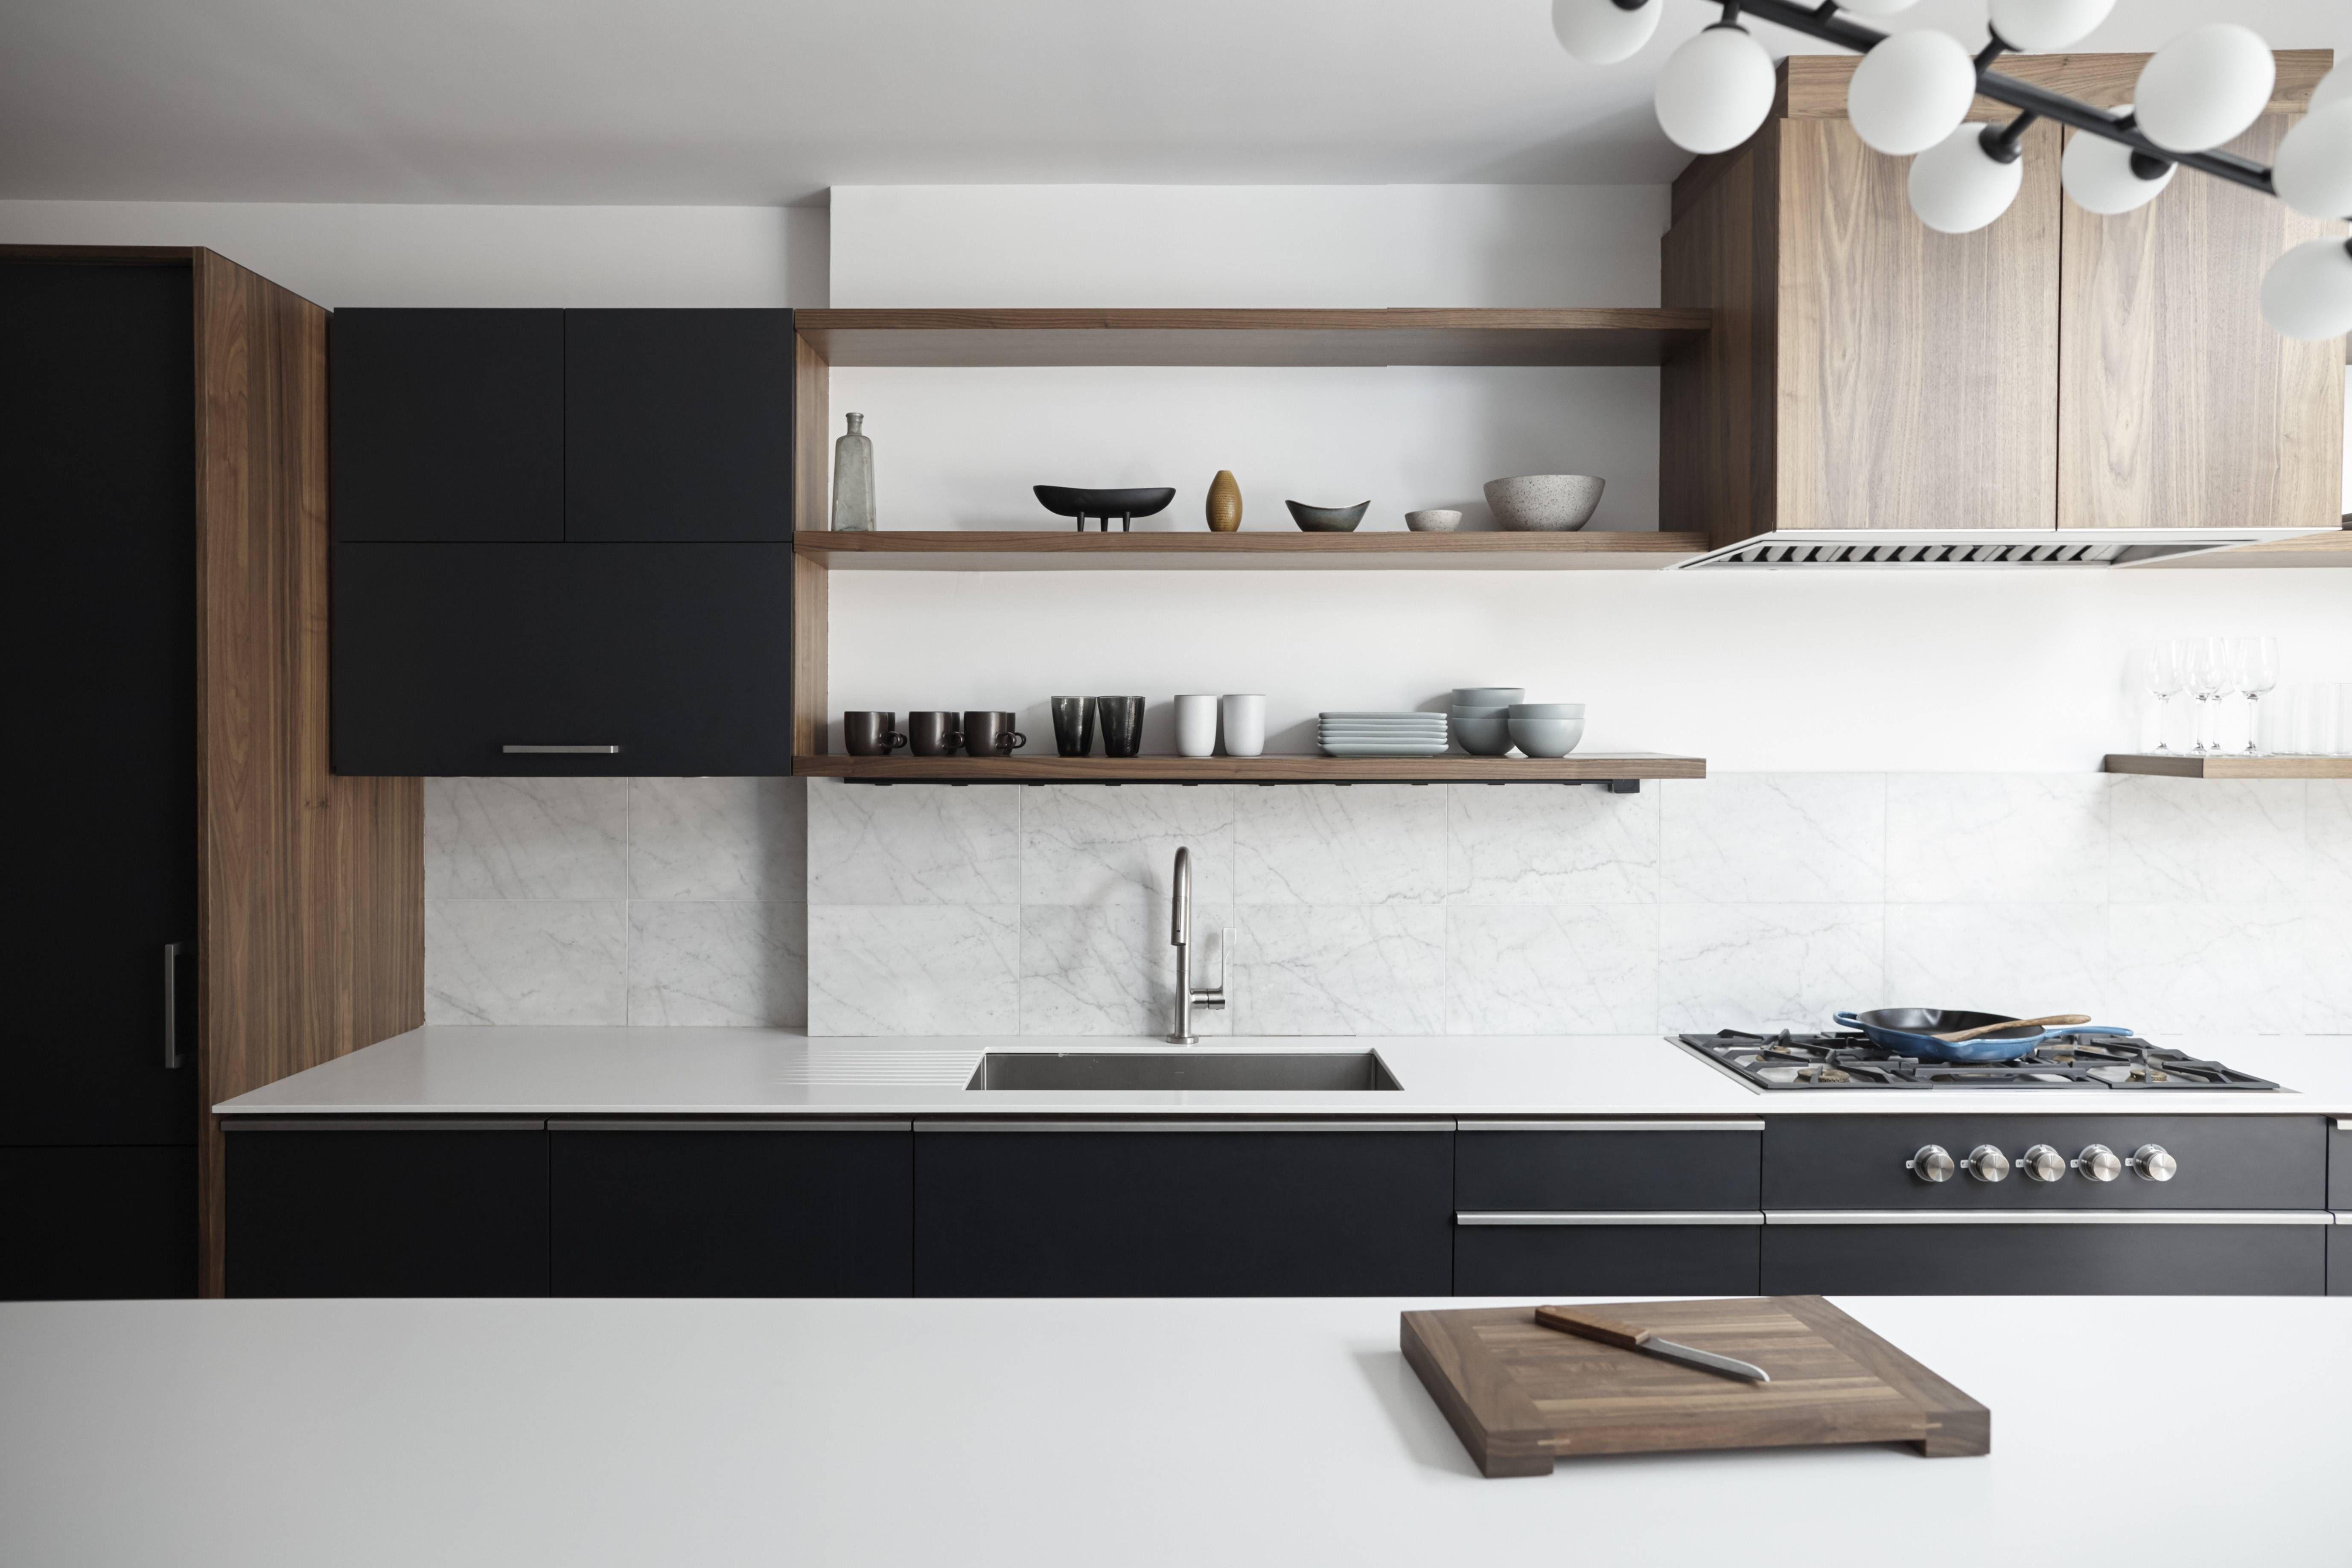 Henrybuilt Custom Kitchen Cabinetry